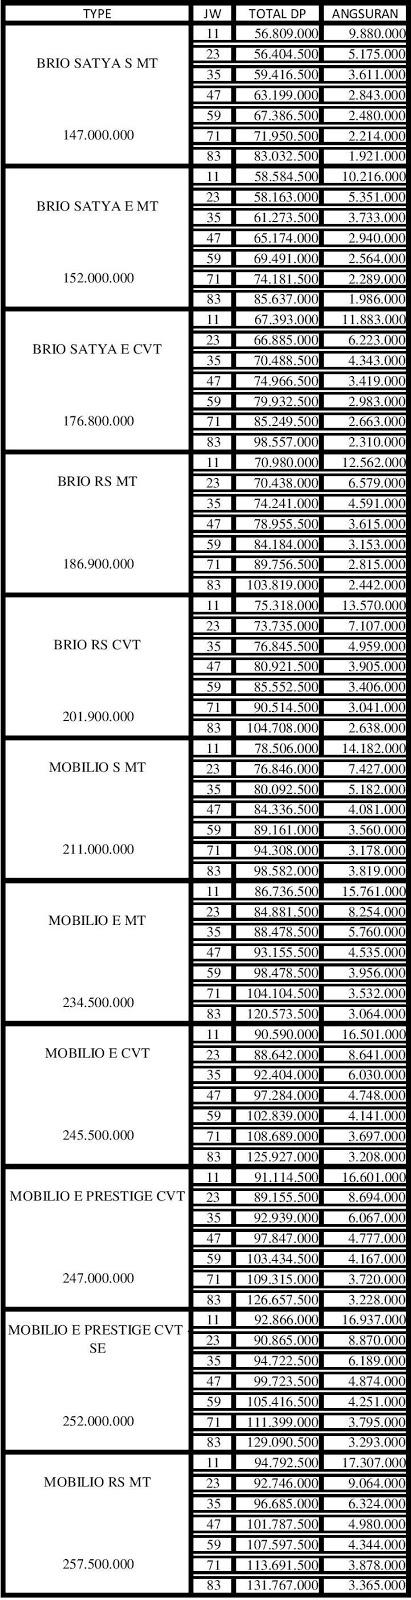 Paket Kredit Bunga Ringan DP 30 Persen ADDM Pekanbaru Riau April 2017